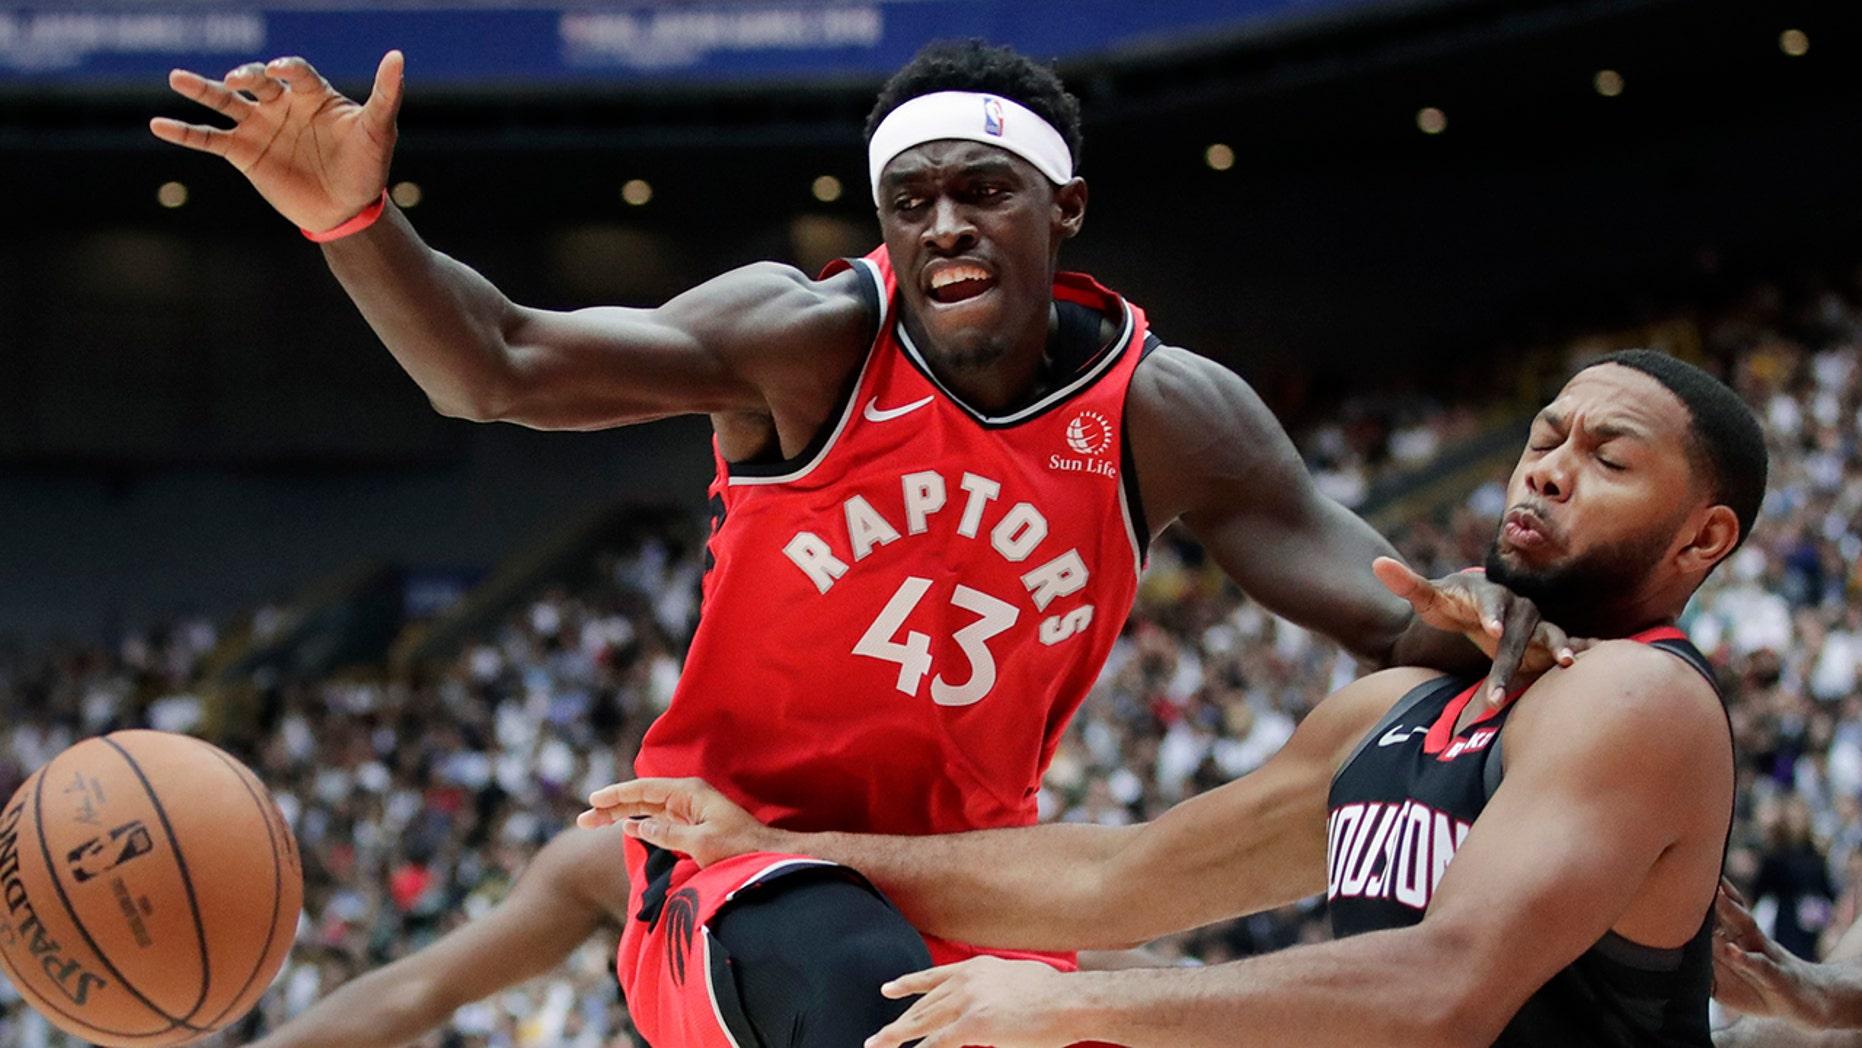 Toronto Raptors' Pascal Siakam, left, fights for a loose ball with Houston Rockets' Eric Gordon during the first half of an NBA preseason basketball game Thursday, Oct. 10, 2019, in Saitama, near Tokyo. (AP Photo/Jae C. Hong)